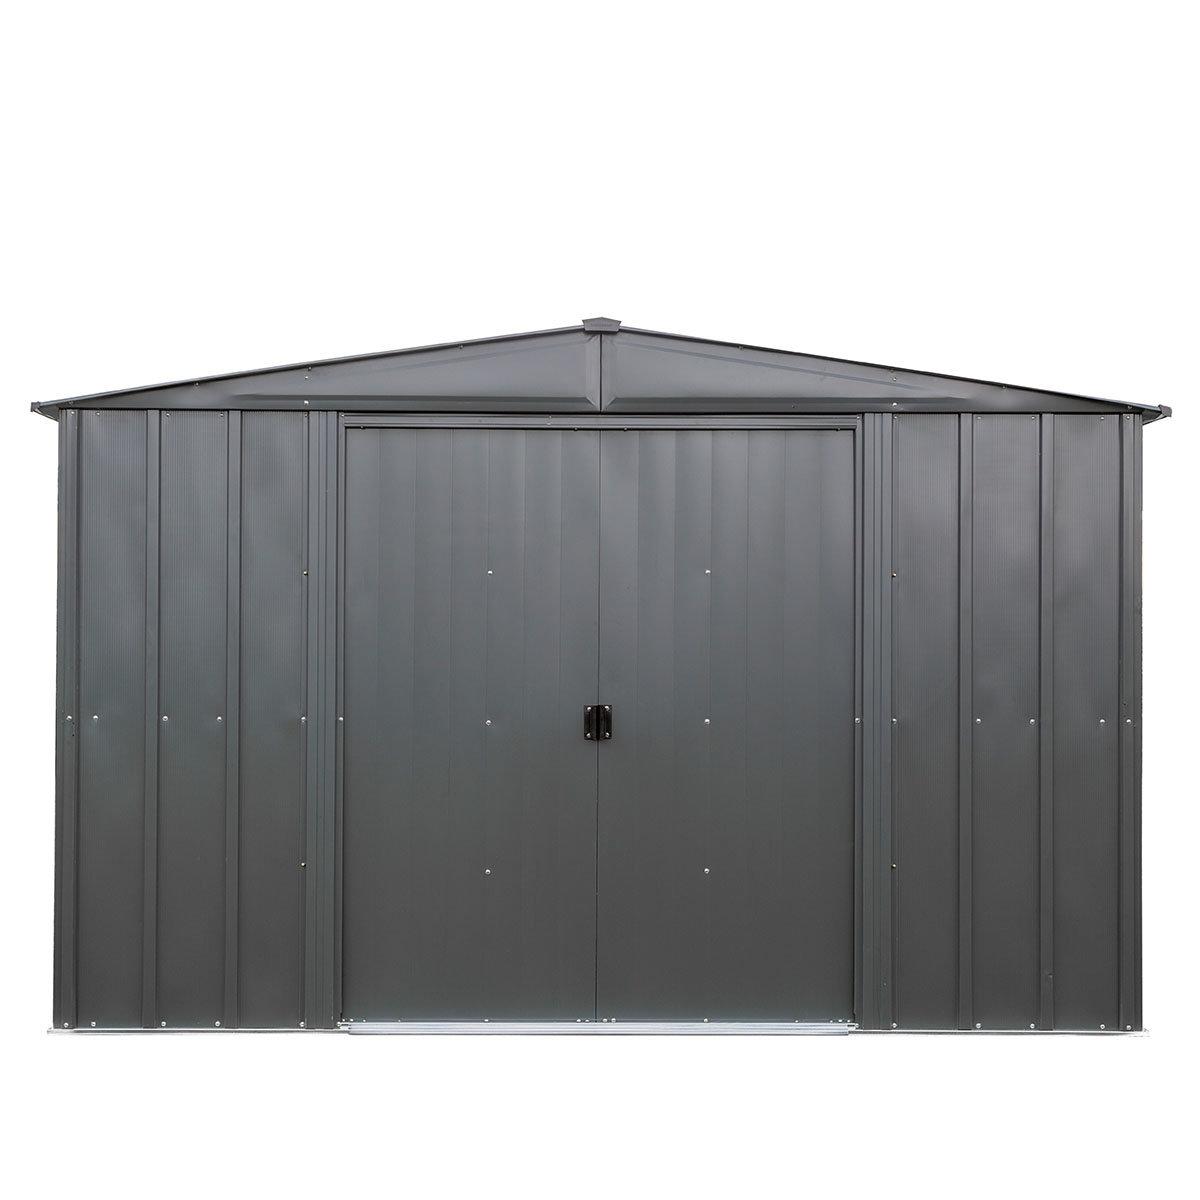 Metallgerätehaus Satteldach 10x10 | #4